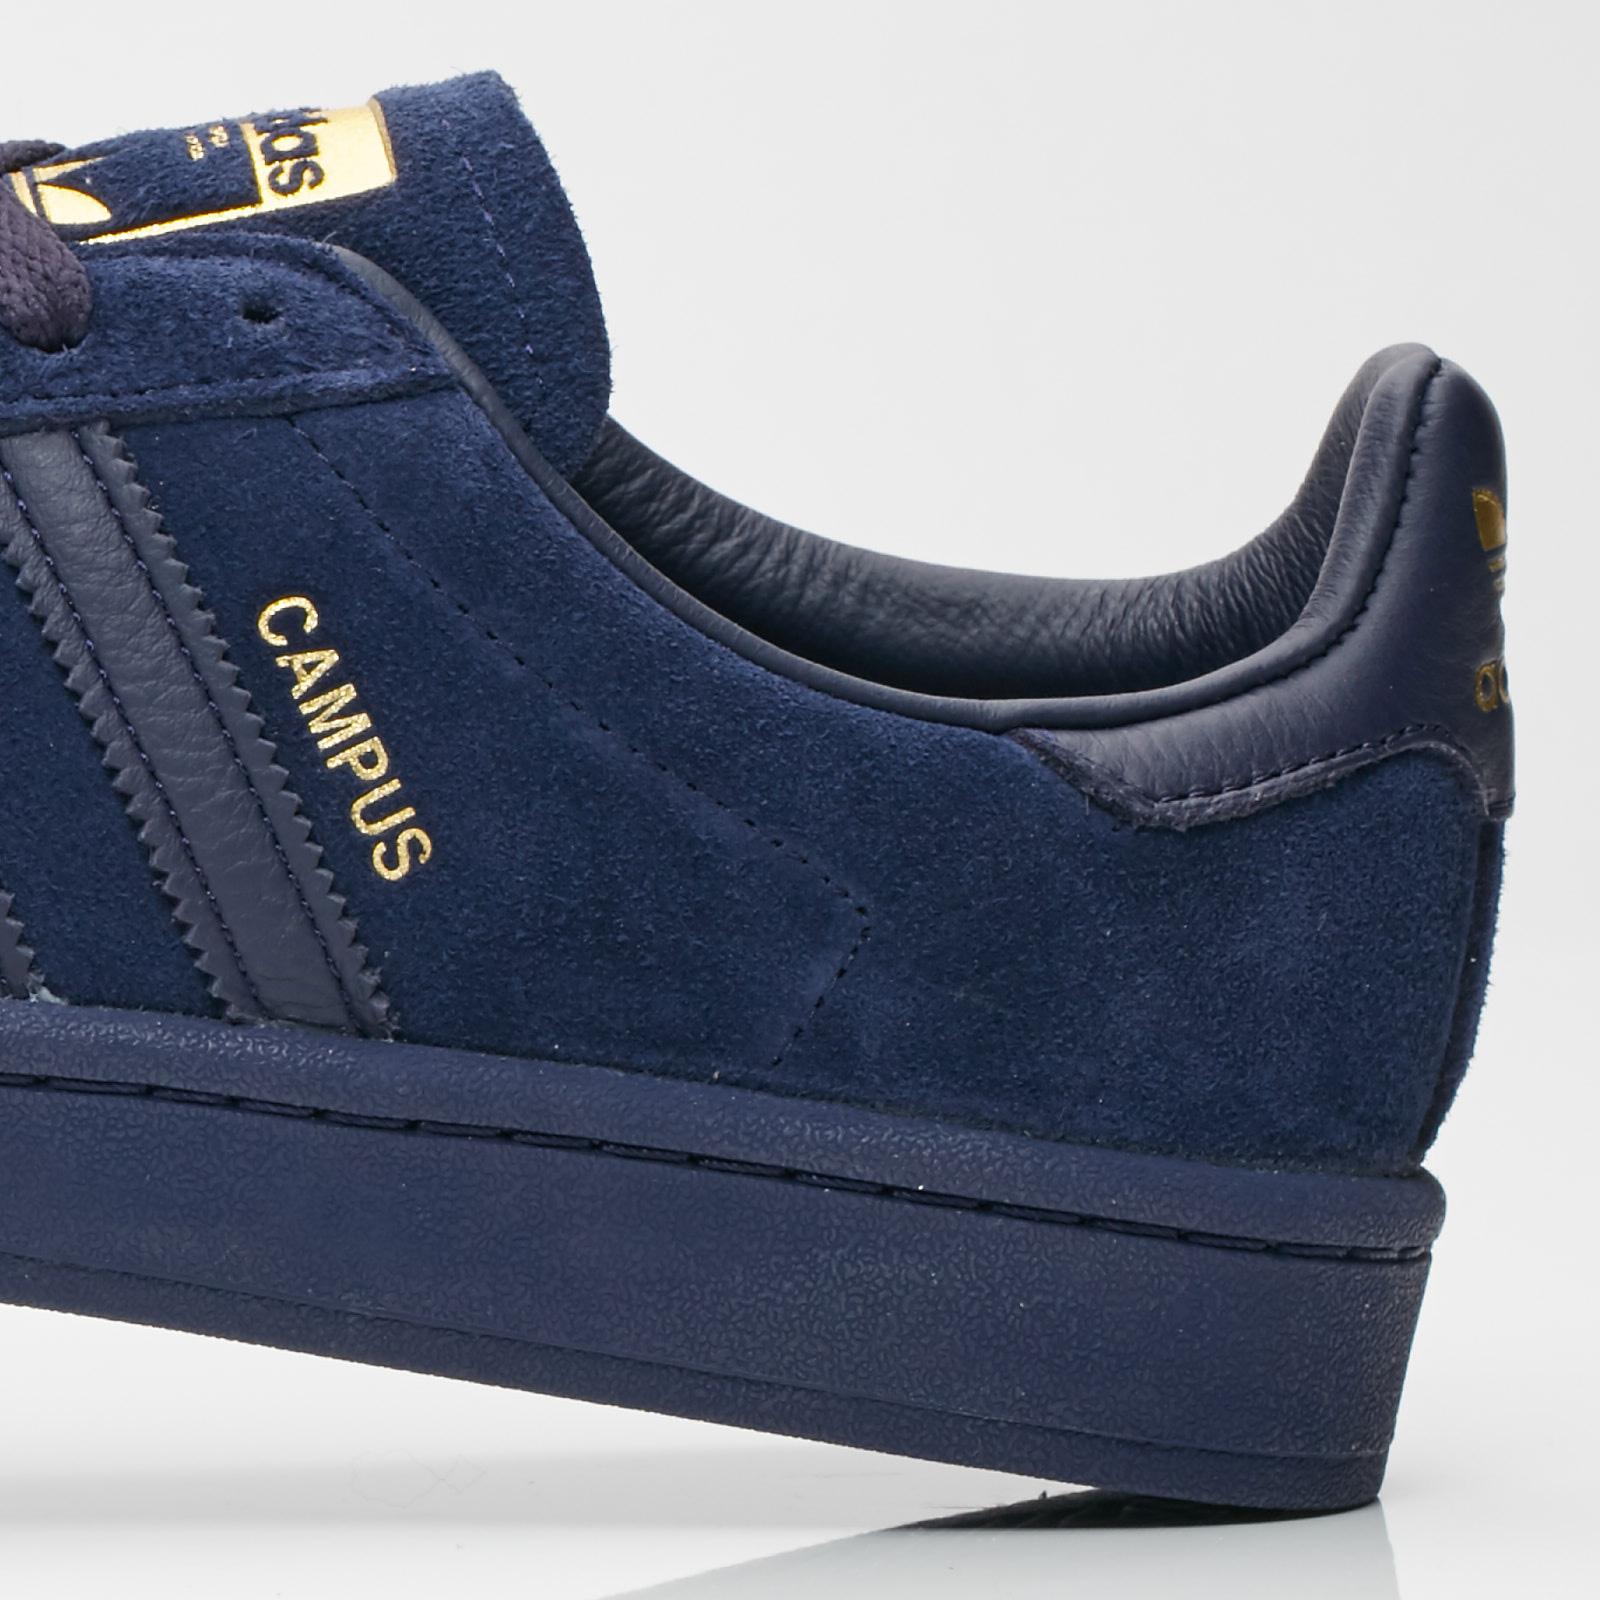 adidas Campus - Cq2045 - Sneakersnstuff